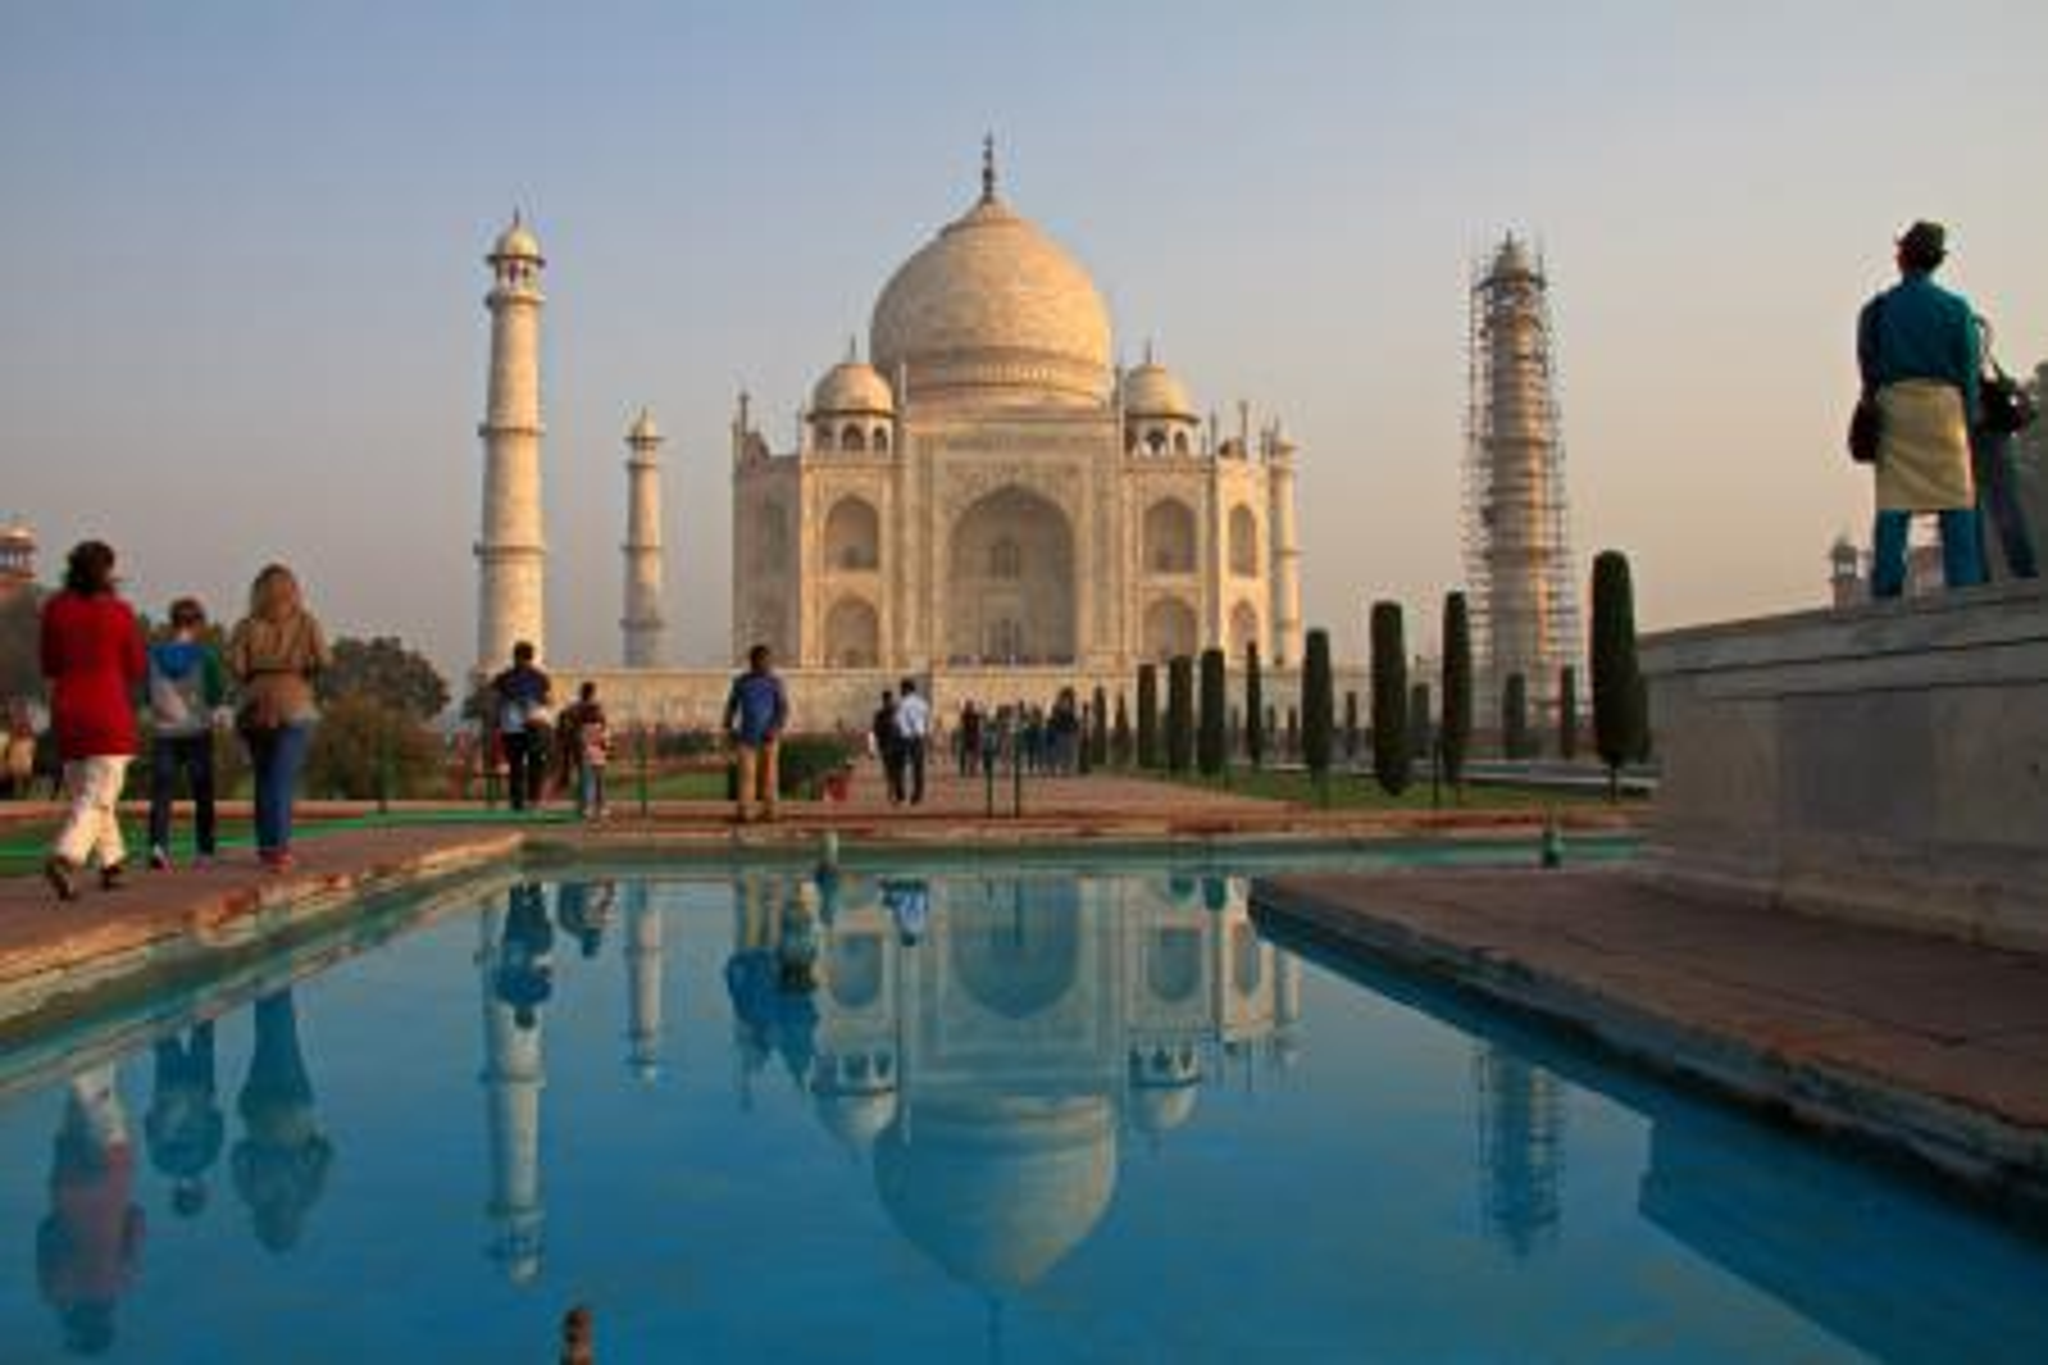 Reflections of Love - Taj Mahal of India by Chandana Witharanage